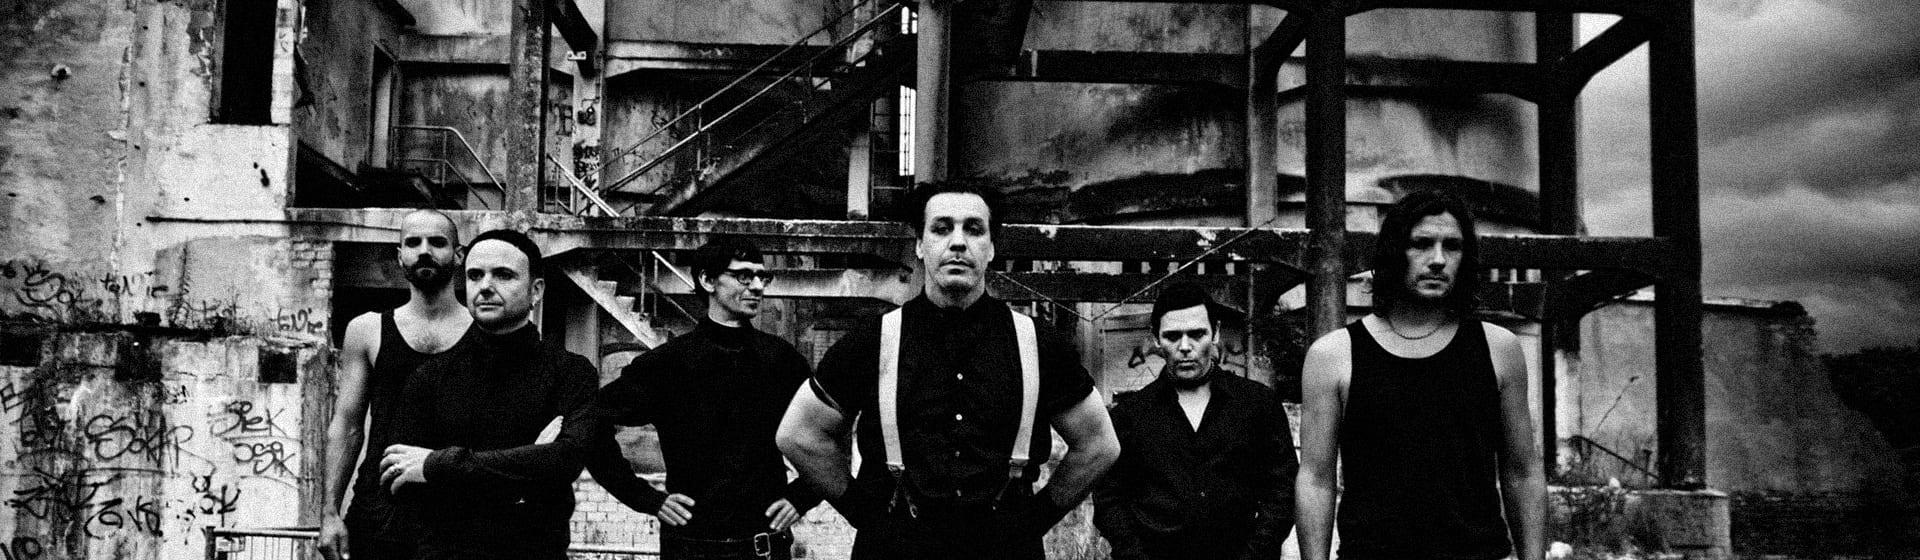 Rammstein - Зимние куртки